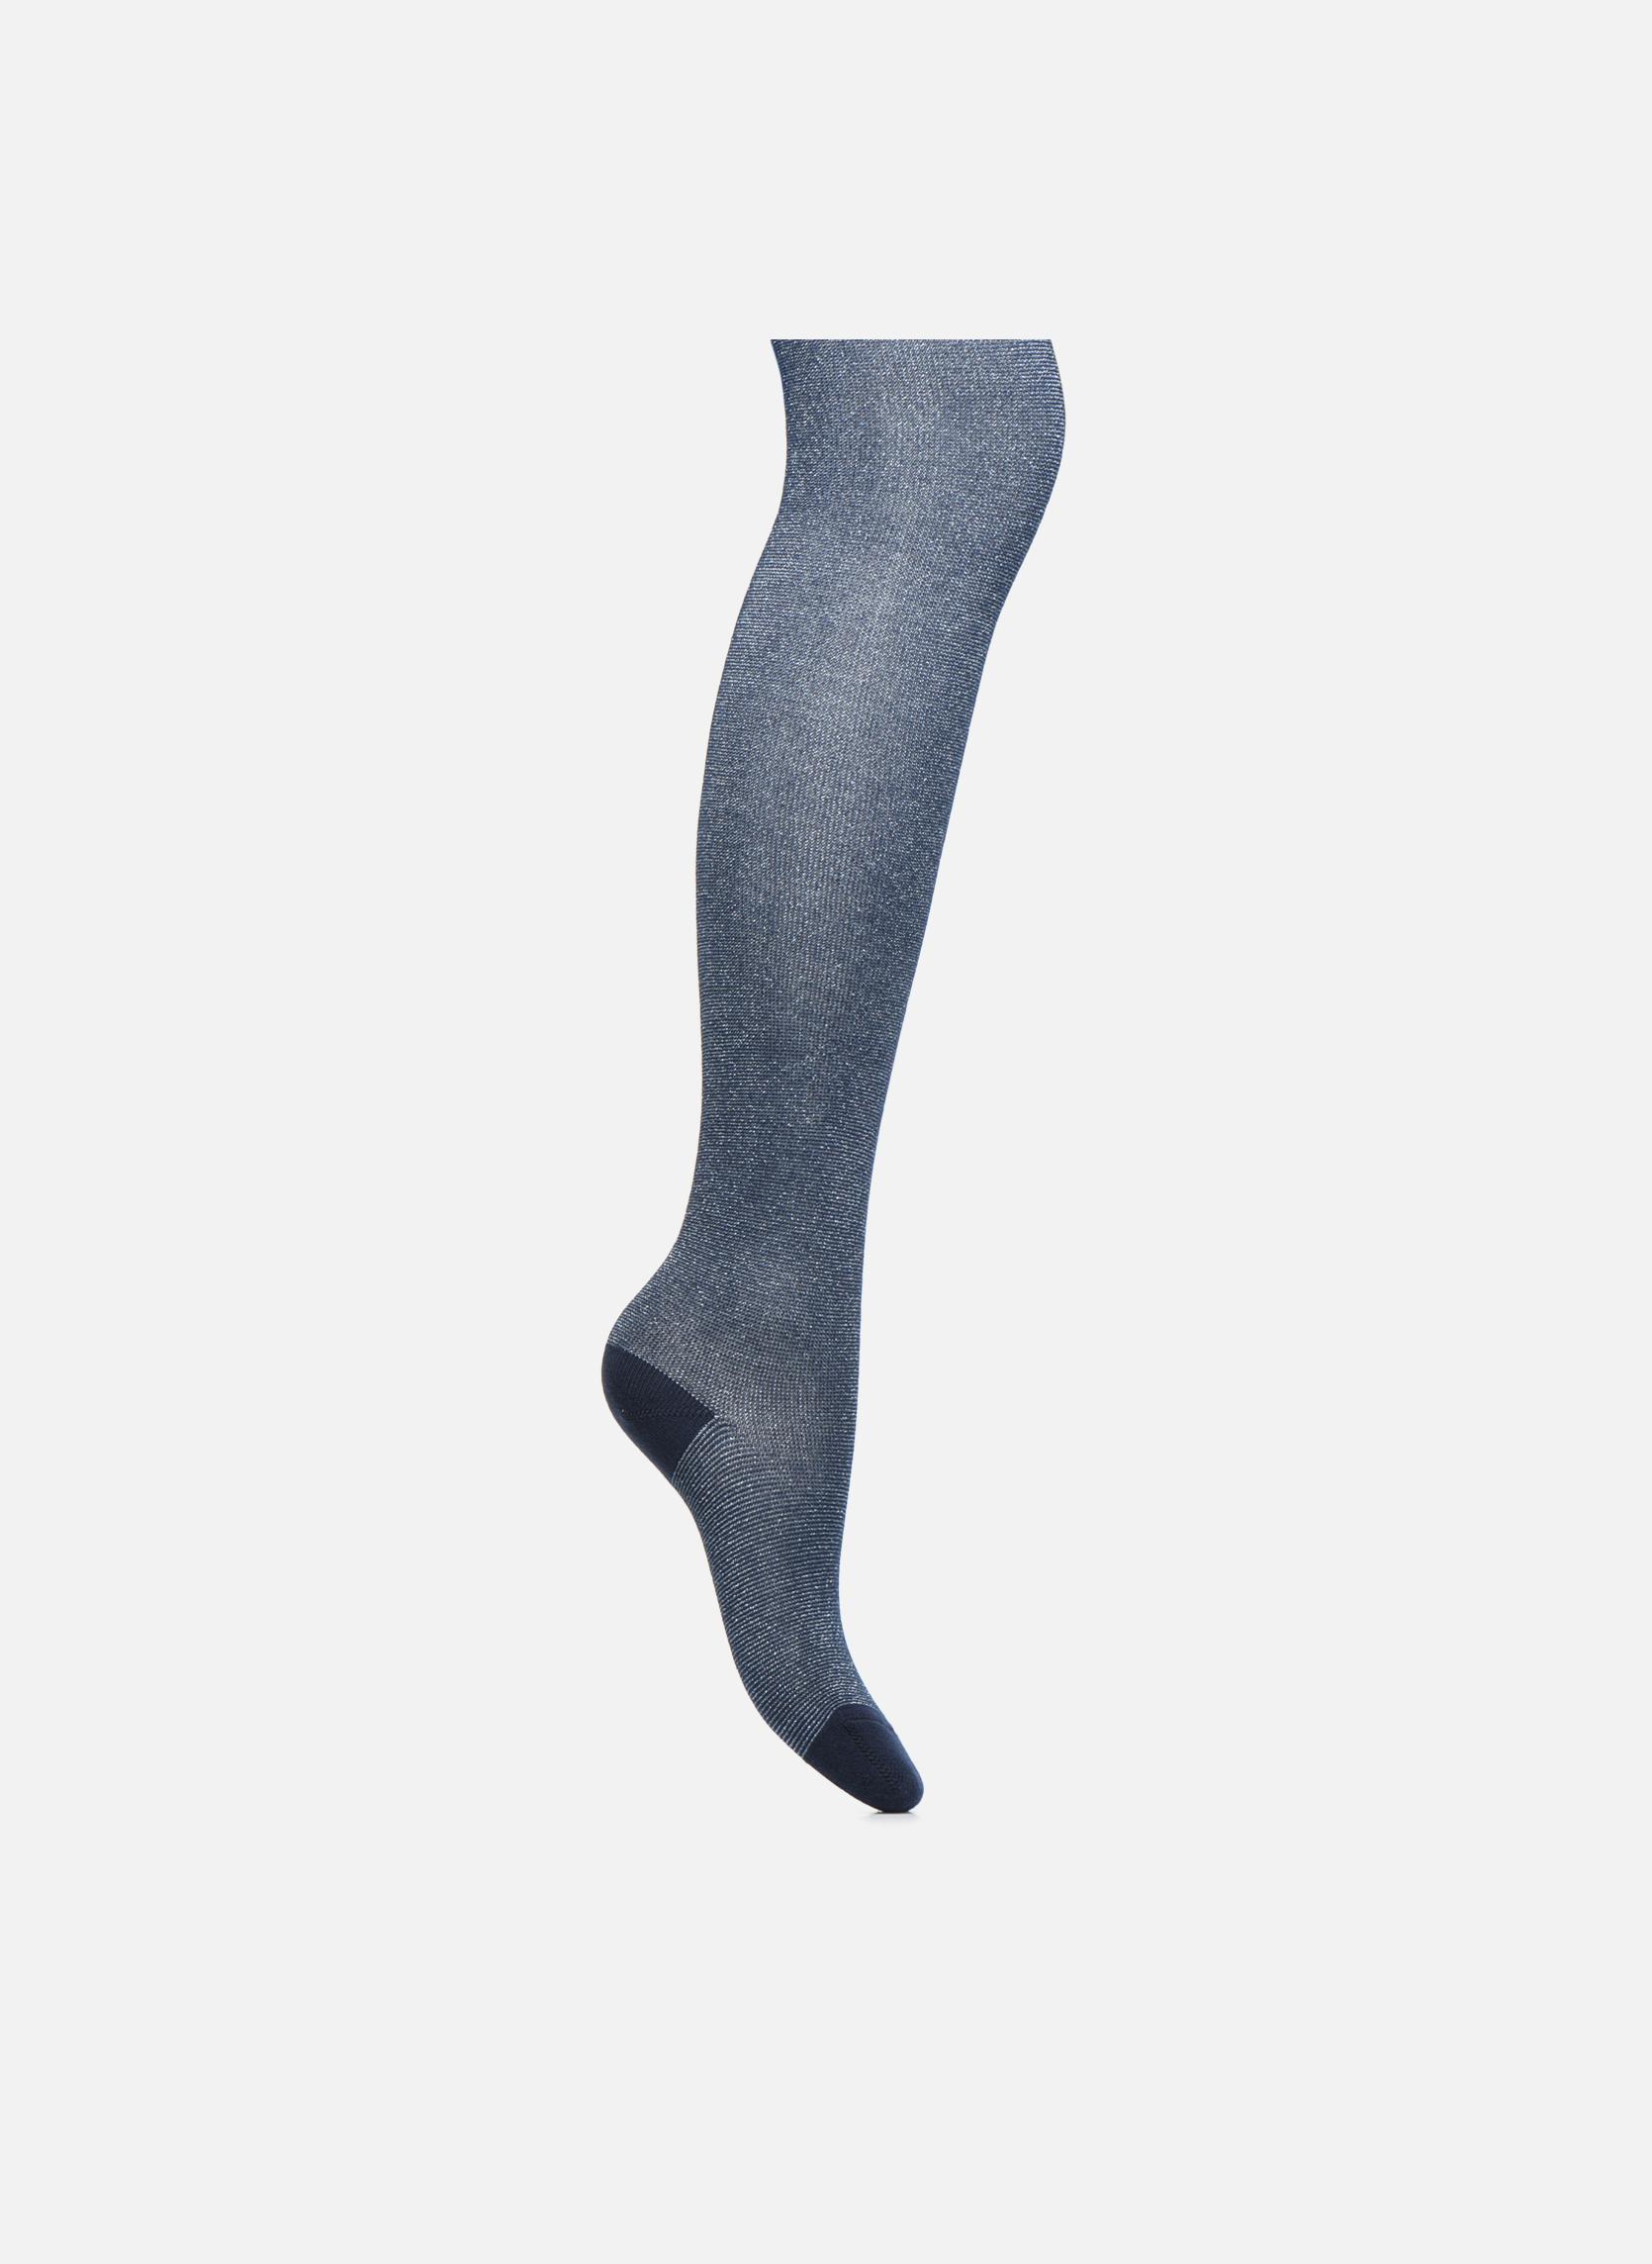 Socken & Strumpfhosen Accessoires Strumpfhose GLITTER